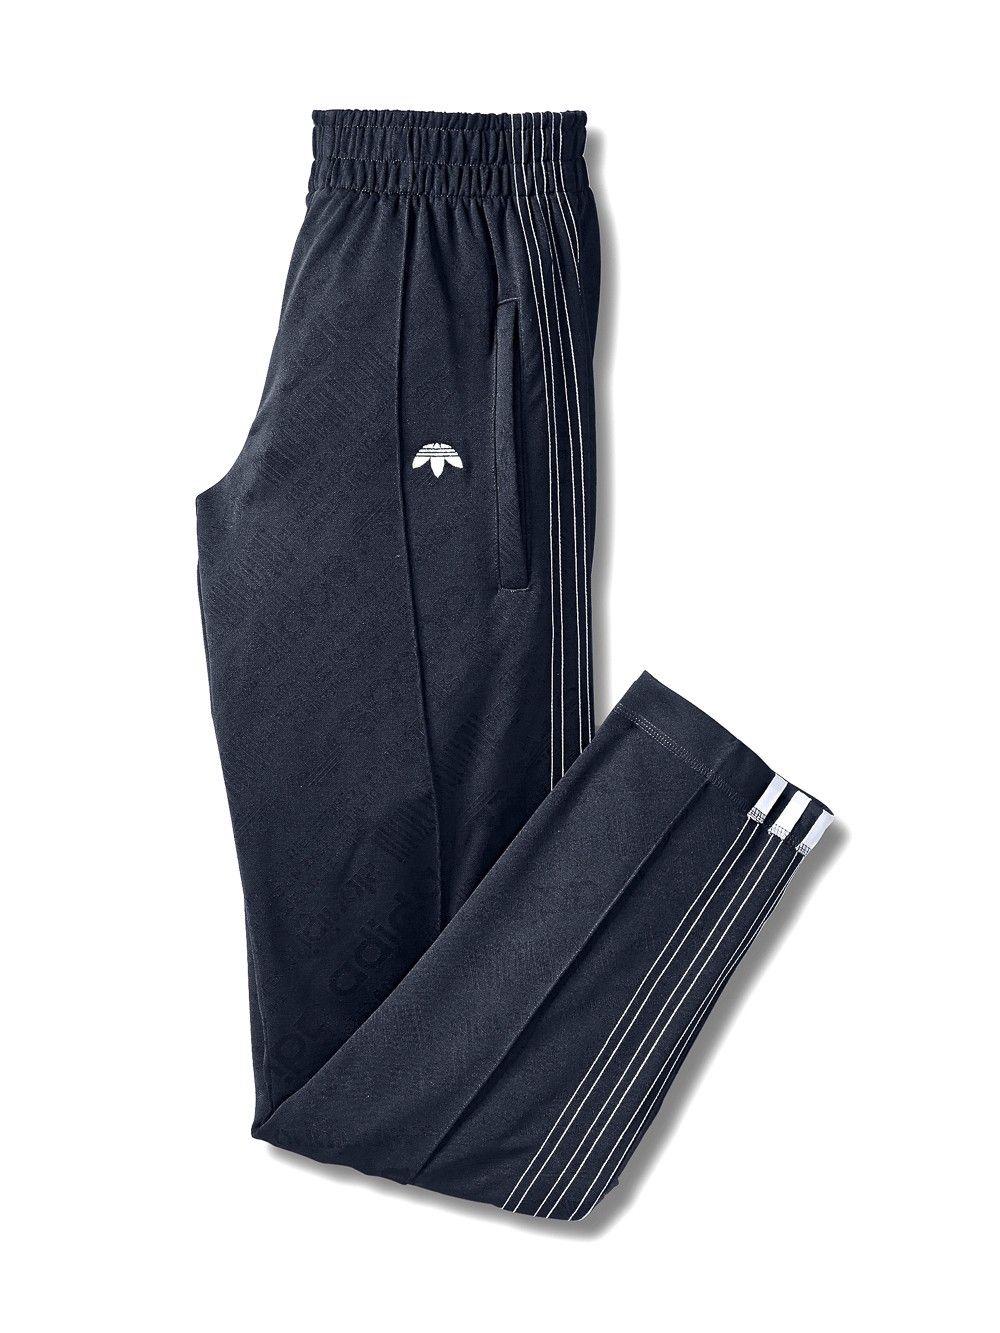 a8a7052c5aa70 ADIDAS ORIGINALS BY ALEXANDER WANG Aw Jacquard Track Pant.   adidasoriginalsbyalexanderwang  cloth